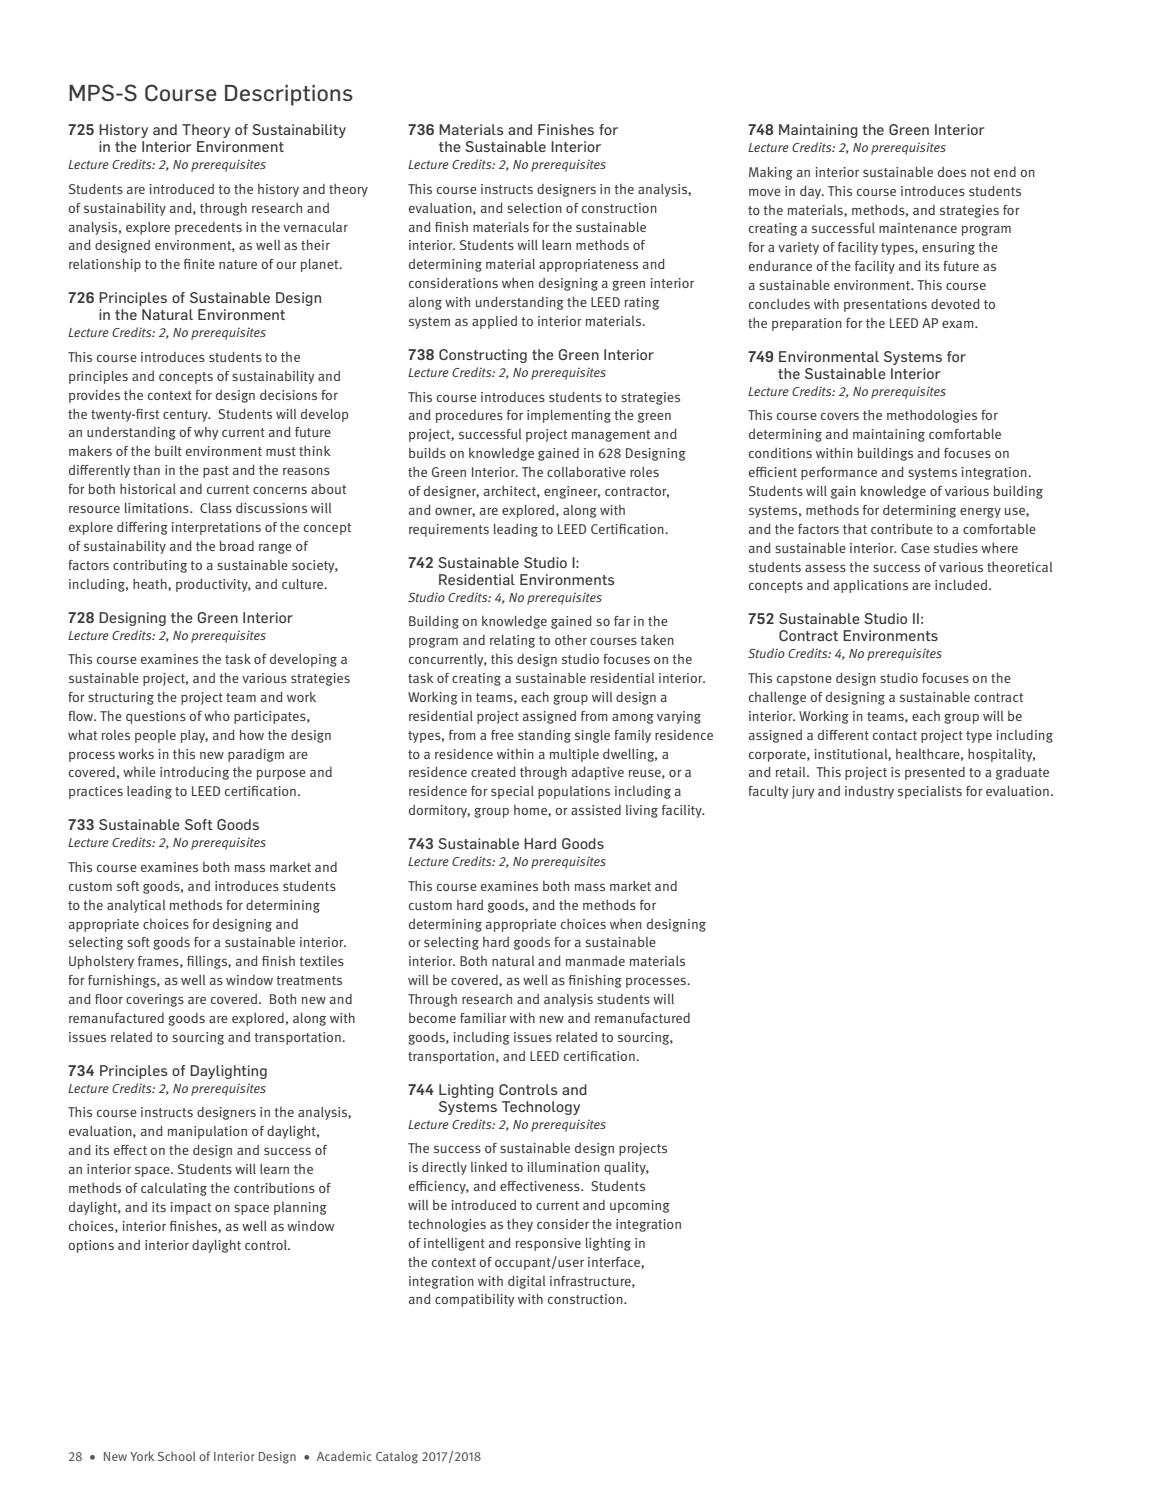 Academic Catalog 20172018 By New York School Of Interior Design Issuu